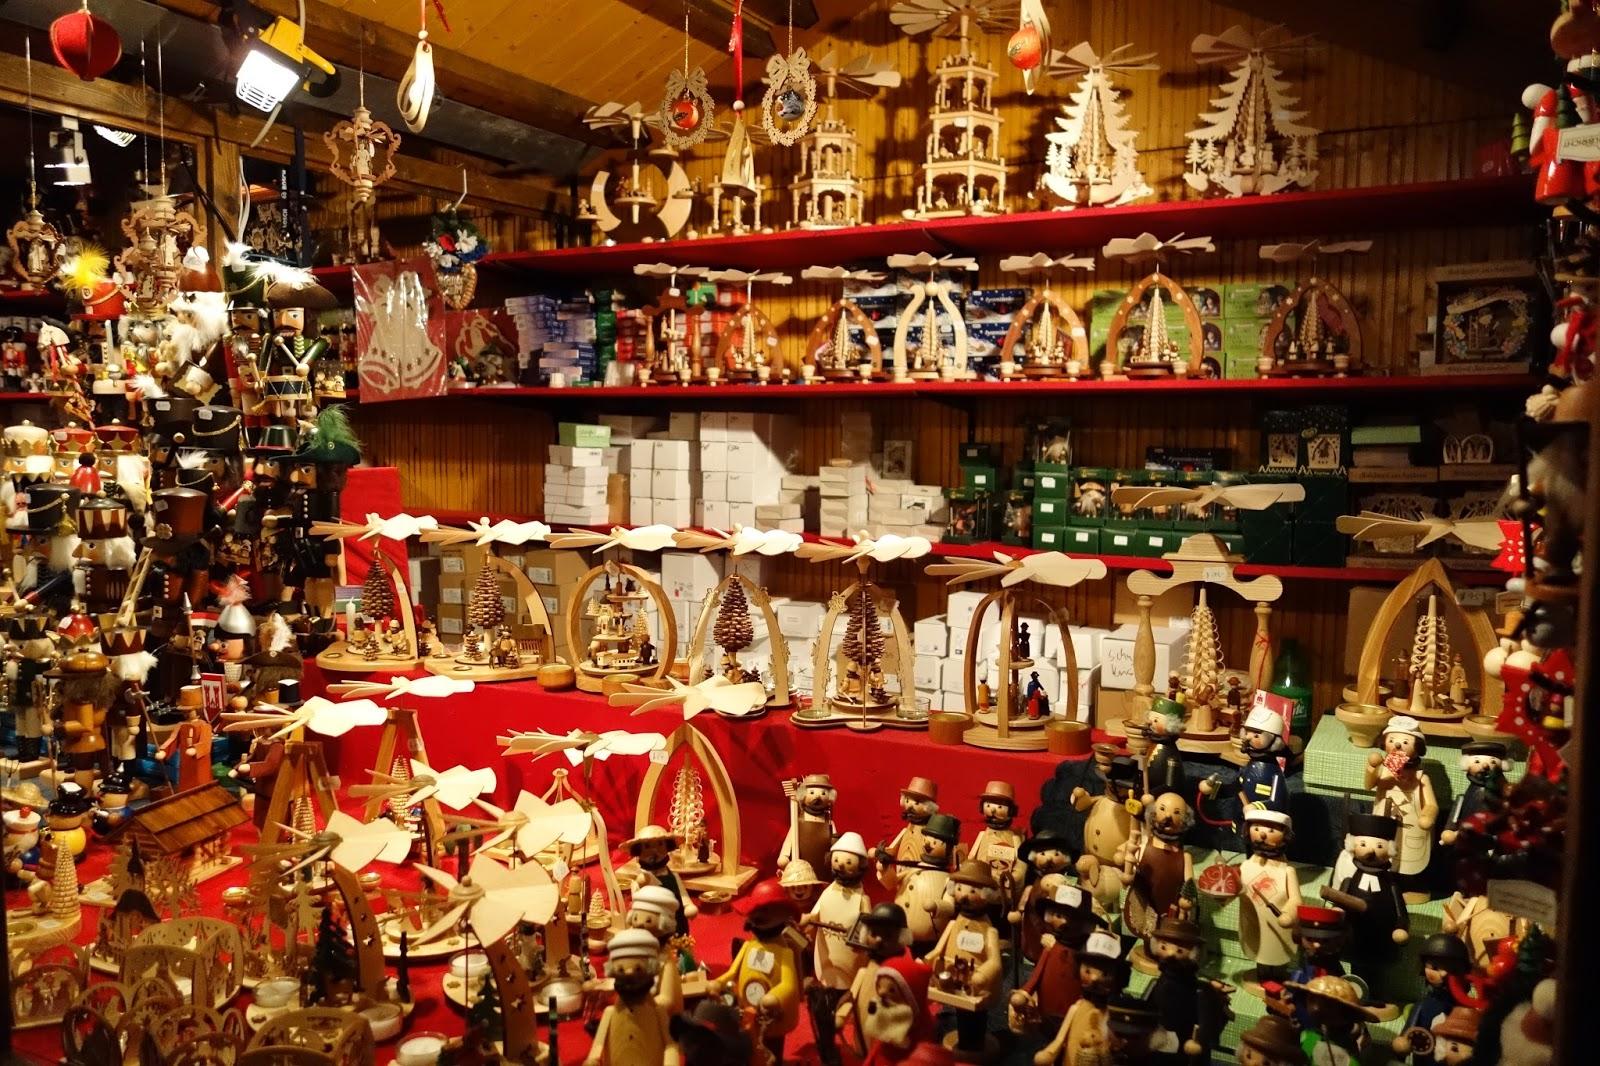 Chicago Christmas Market.Moments Of Delight Anne Reeves Christkindlmarket Chicago